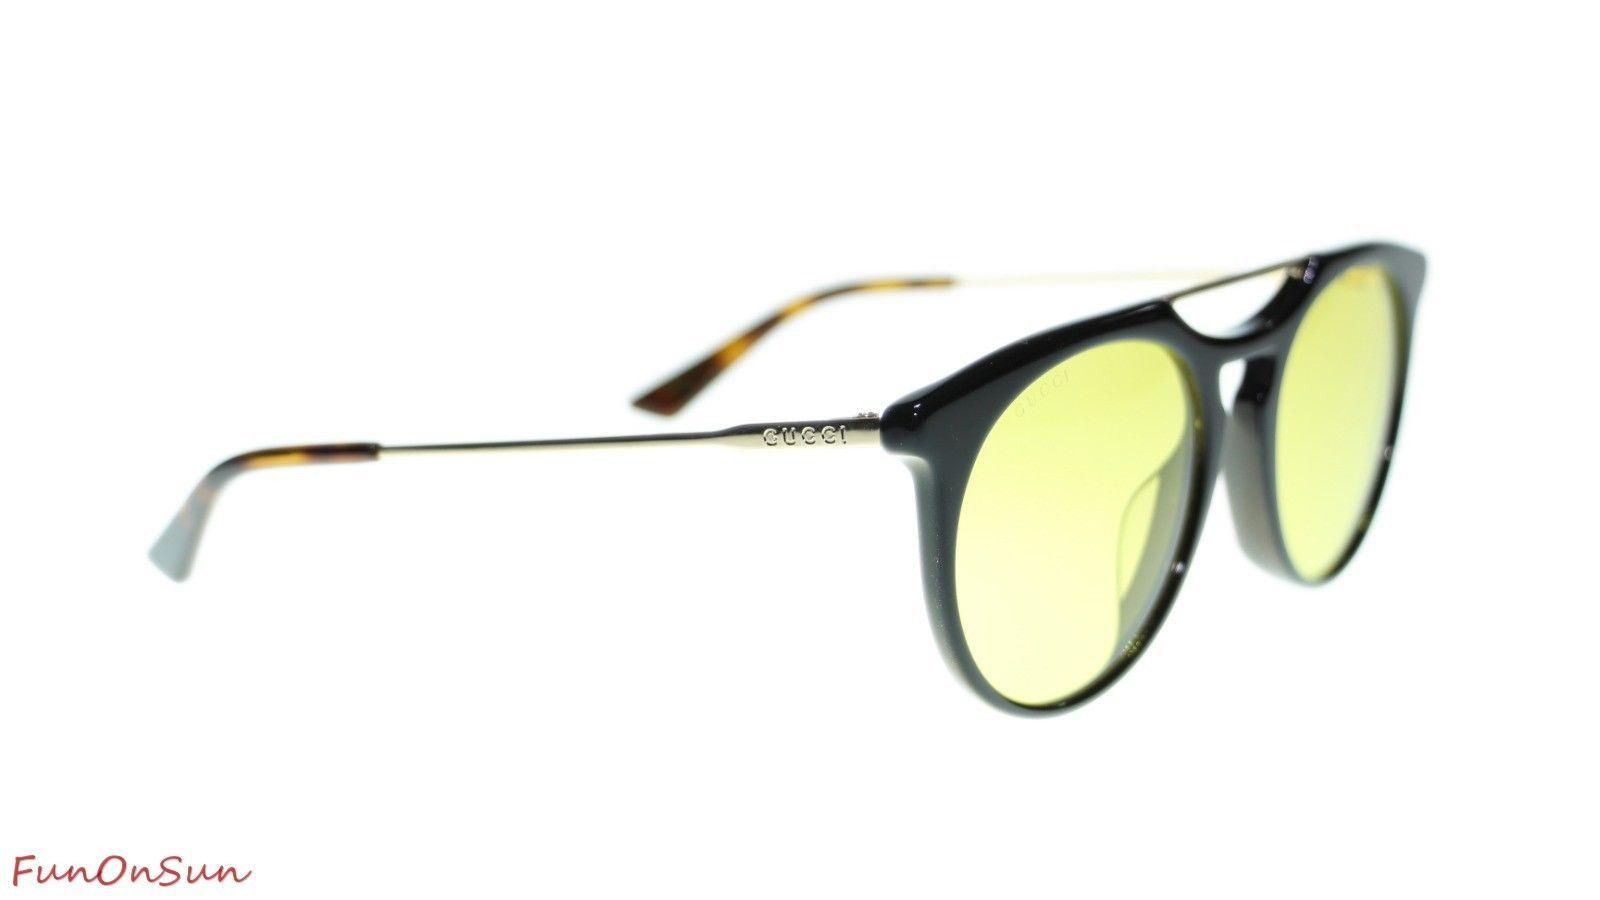 6d99eb3aeb2 NEW Gucci Men Sunglasses GG0320S 002 Black Gold Yellow Lens 53mm Authentic